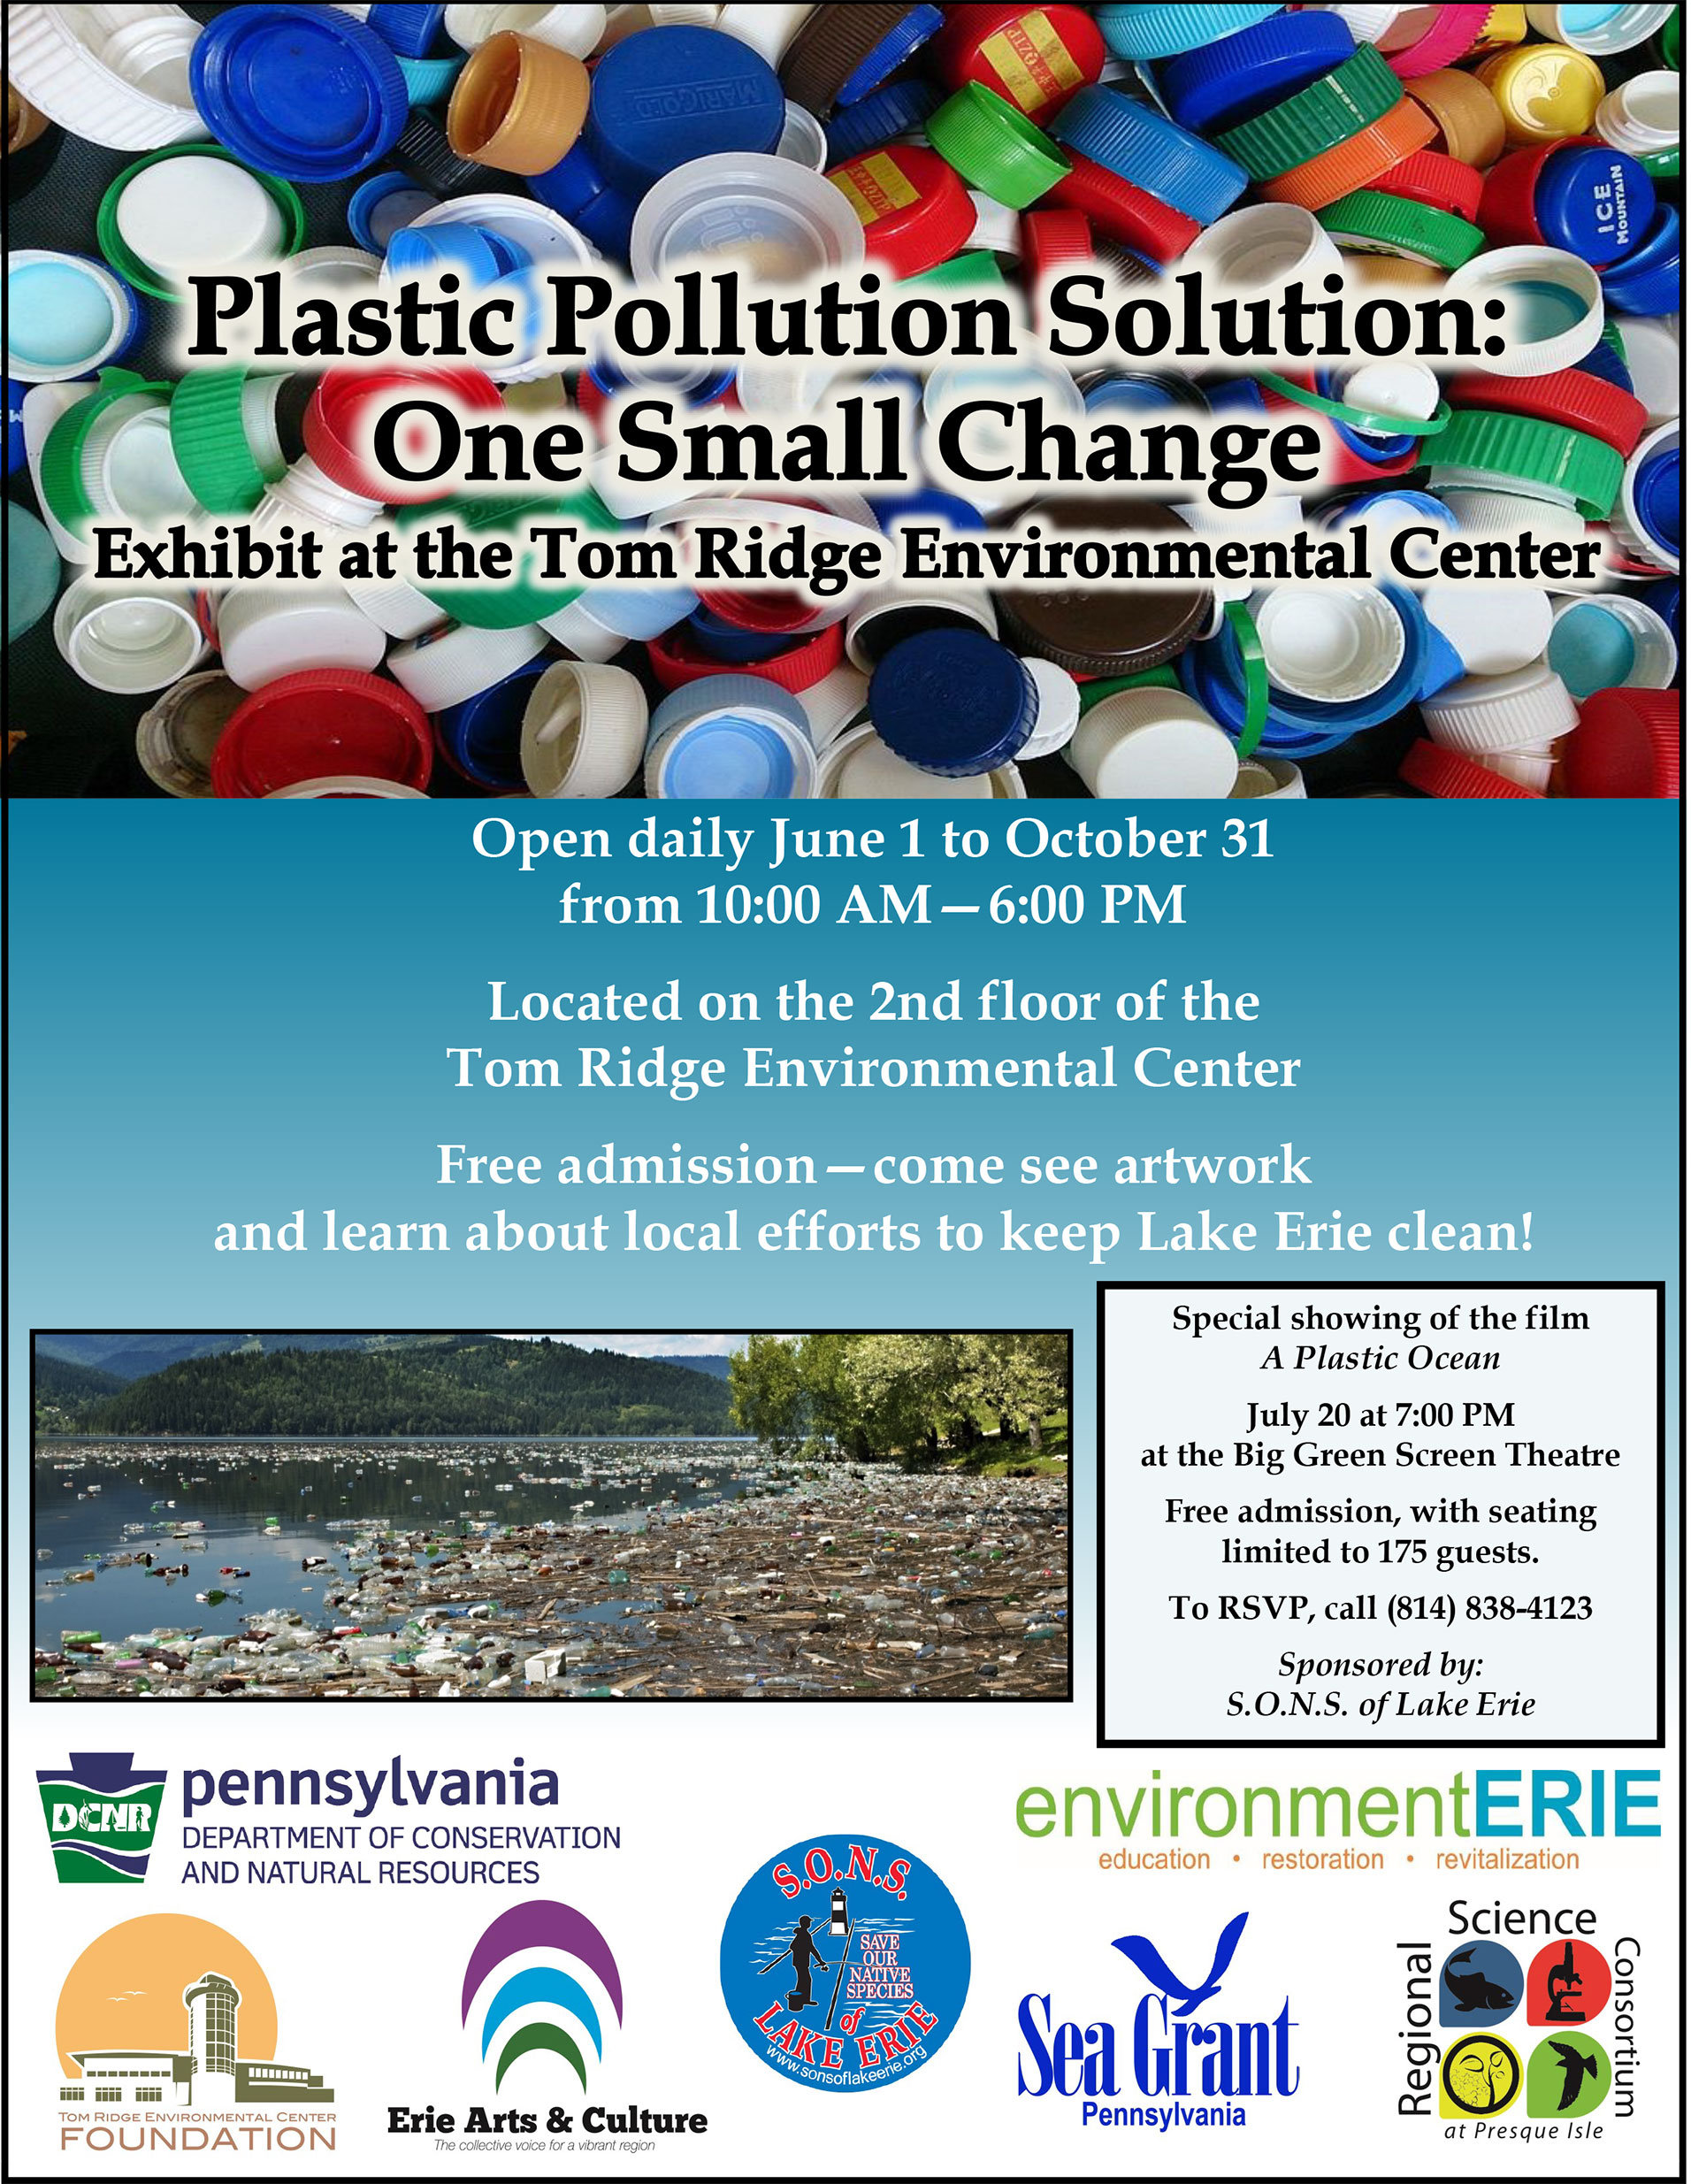 Pollution Exhibit Poster Edition 4.jpg